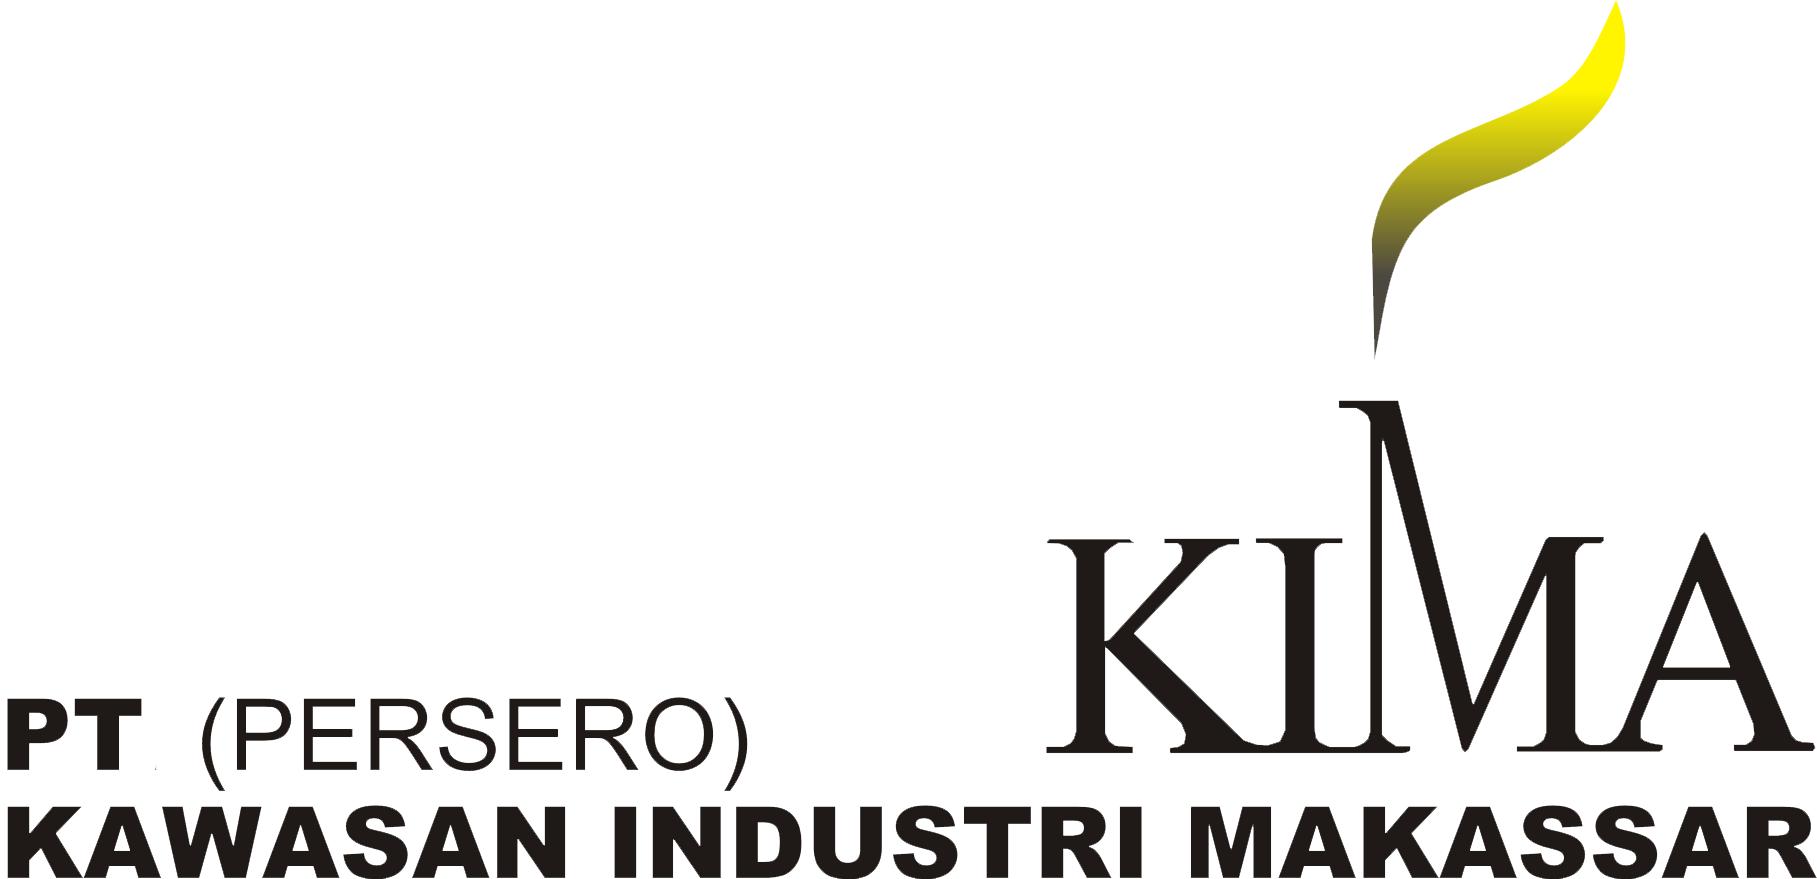 PT KAWASAN INDUSTRI MAKASSAR (PERSERO) | OFFICIAL